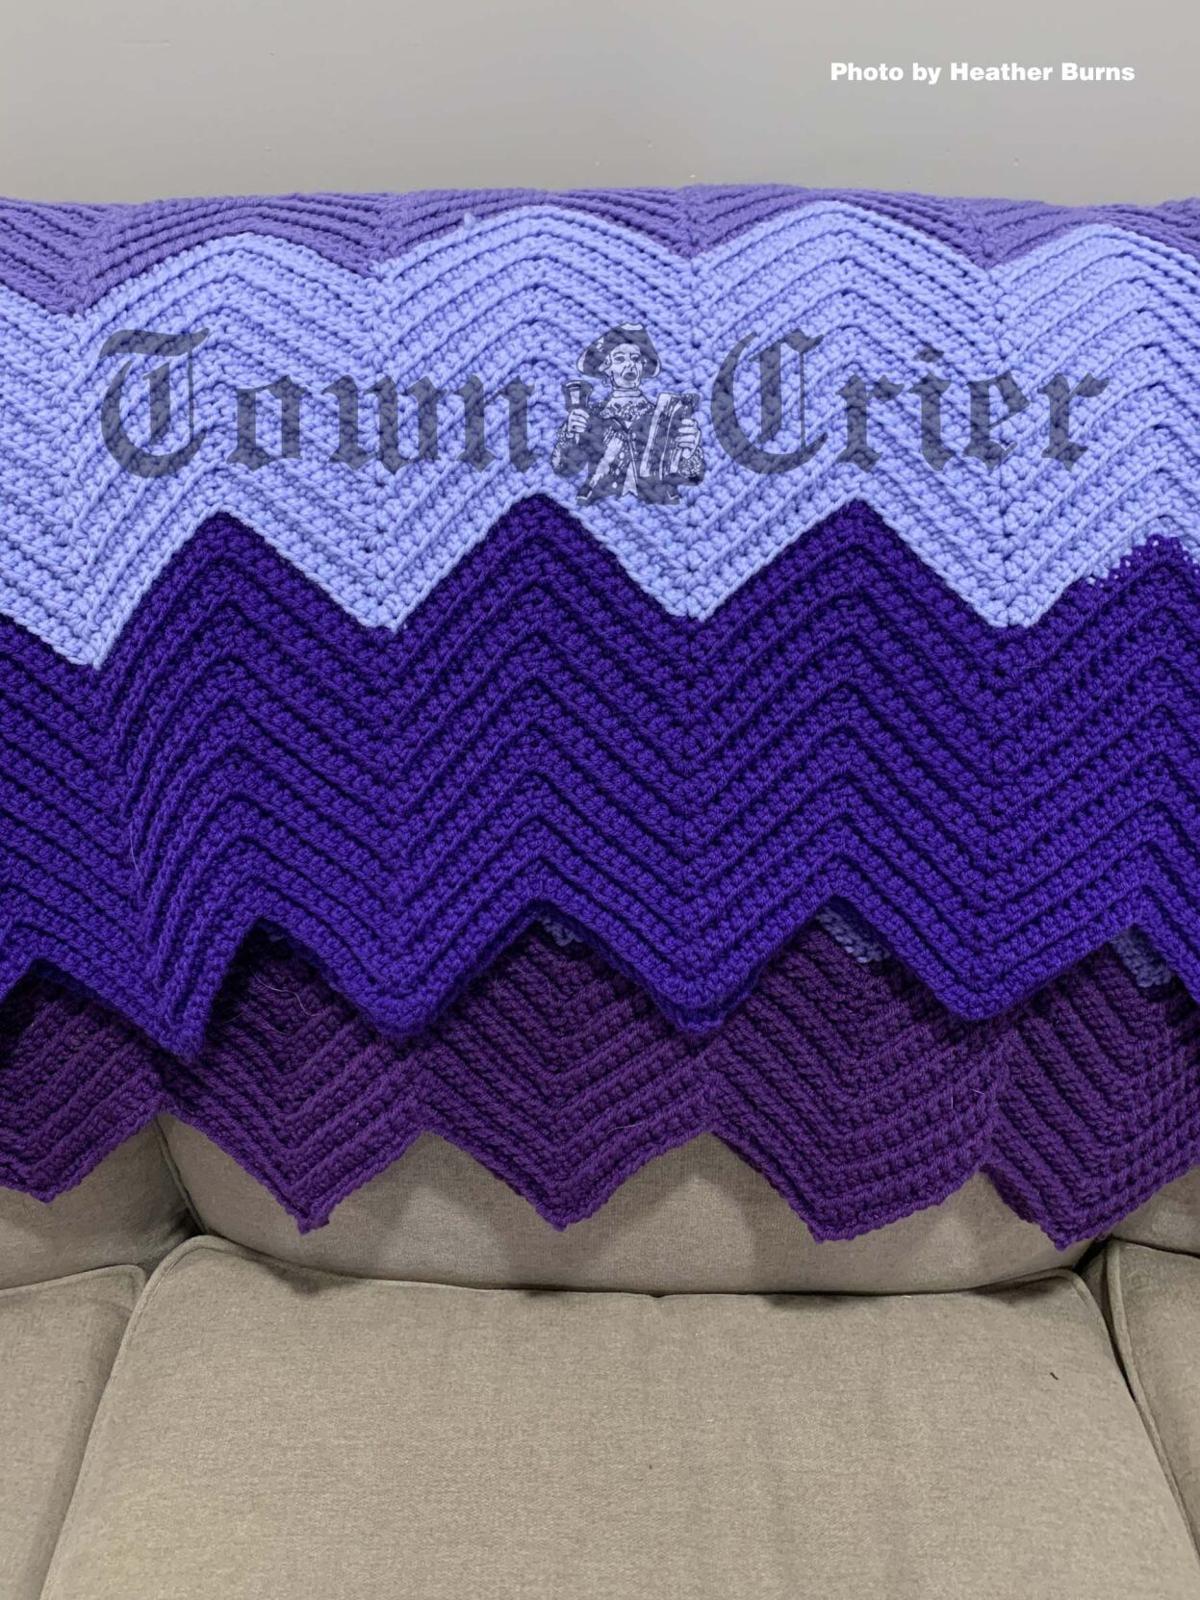 A common crochet pattern